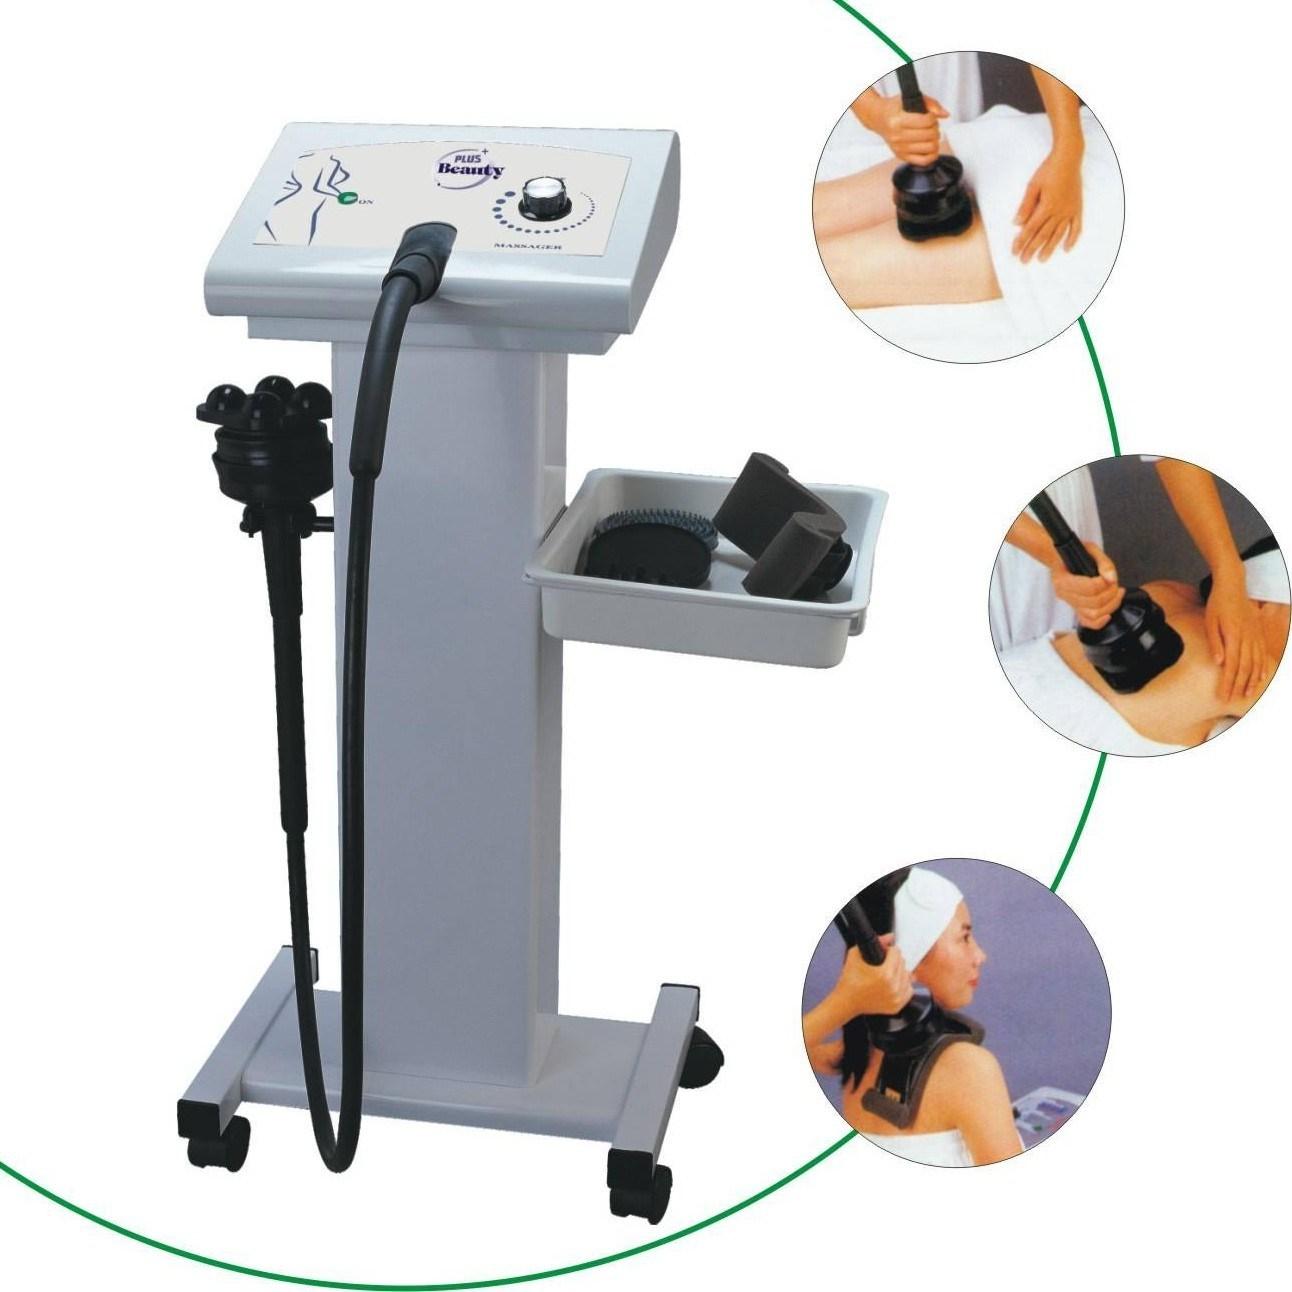 Massager G5 Vibrating Body Slimming Beauty Equipment (B-8315)